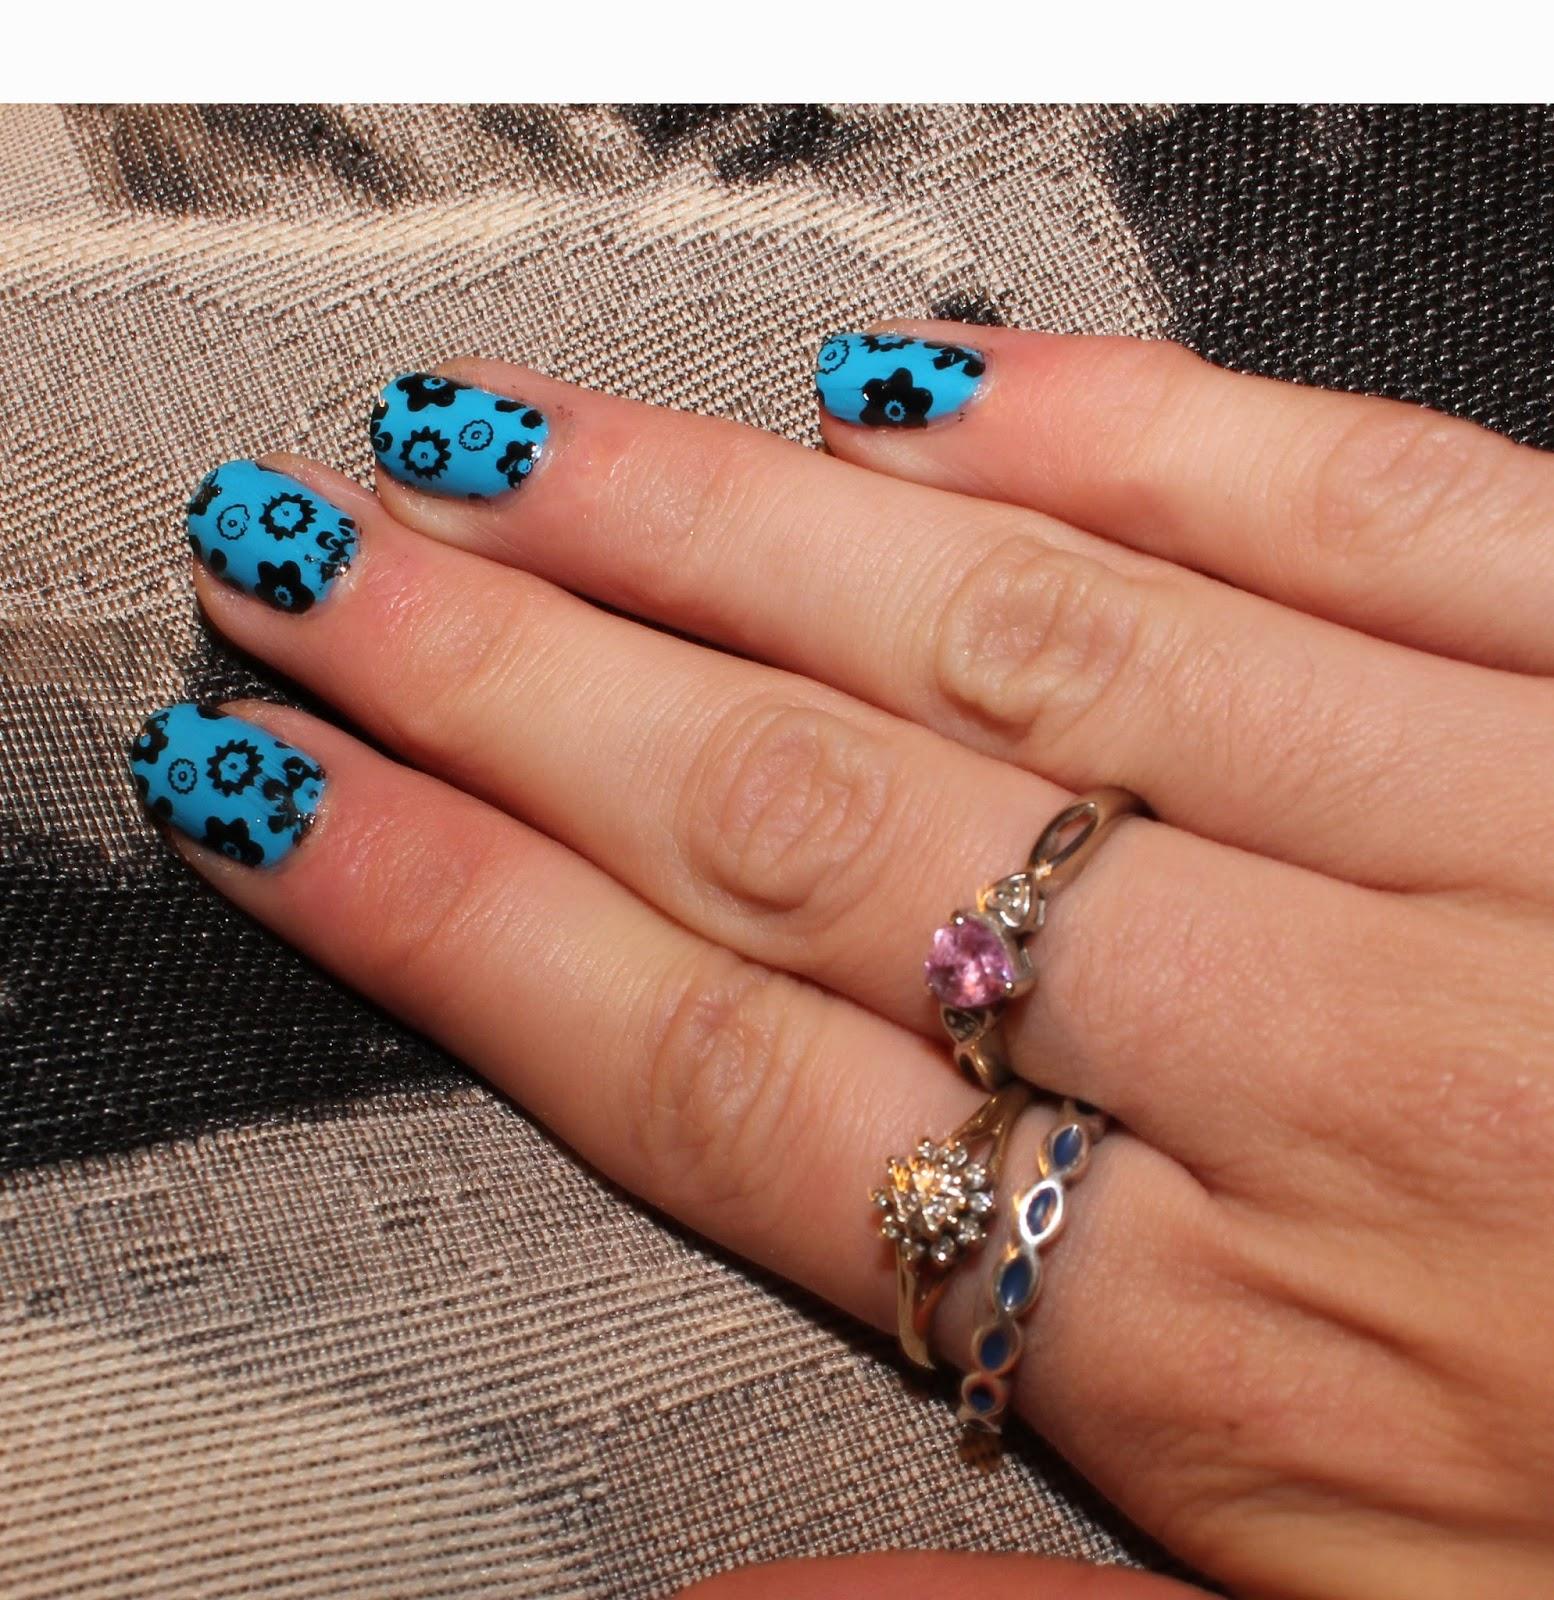 Manicure Monday - MoYou Nail Art: Nail Stamping - Ami Rose